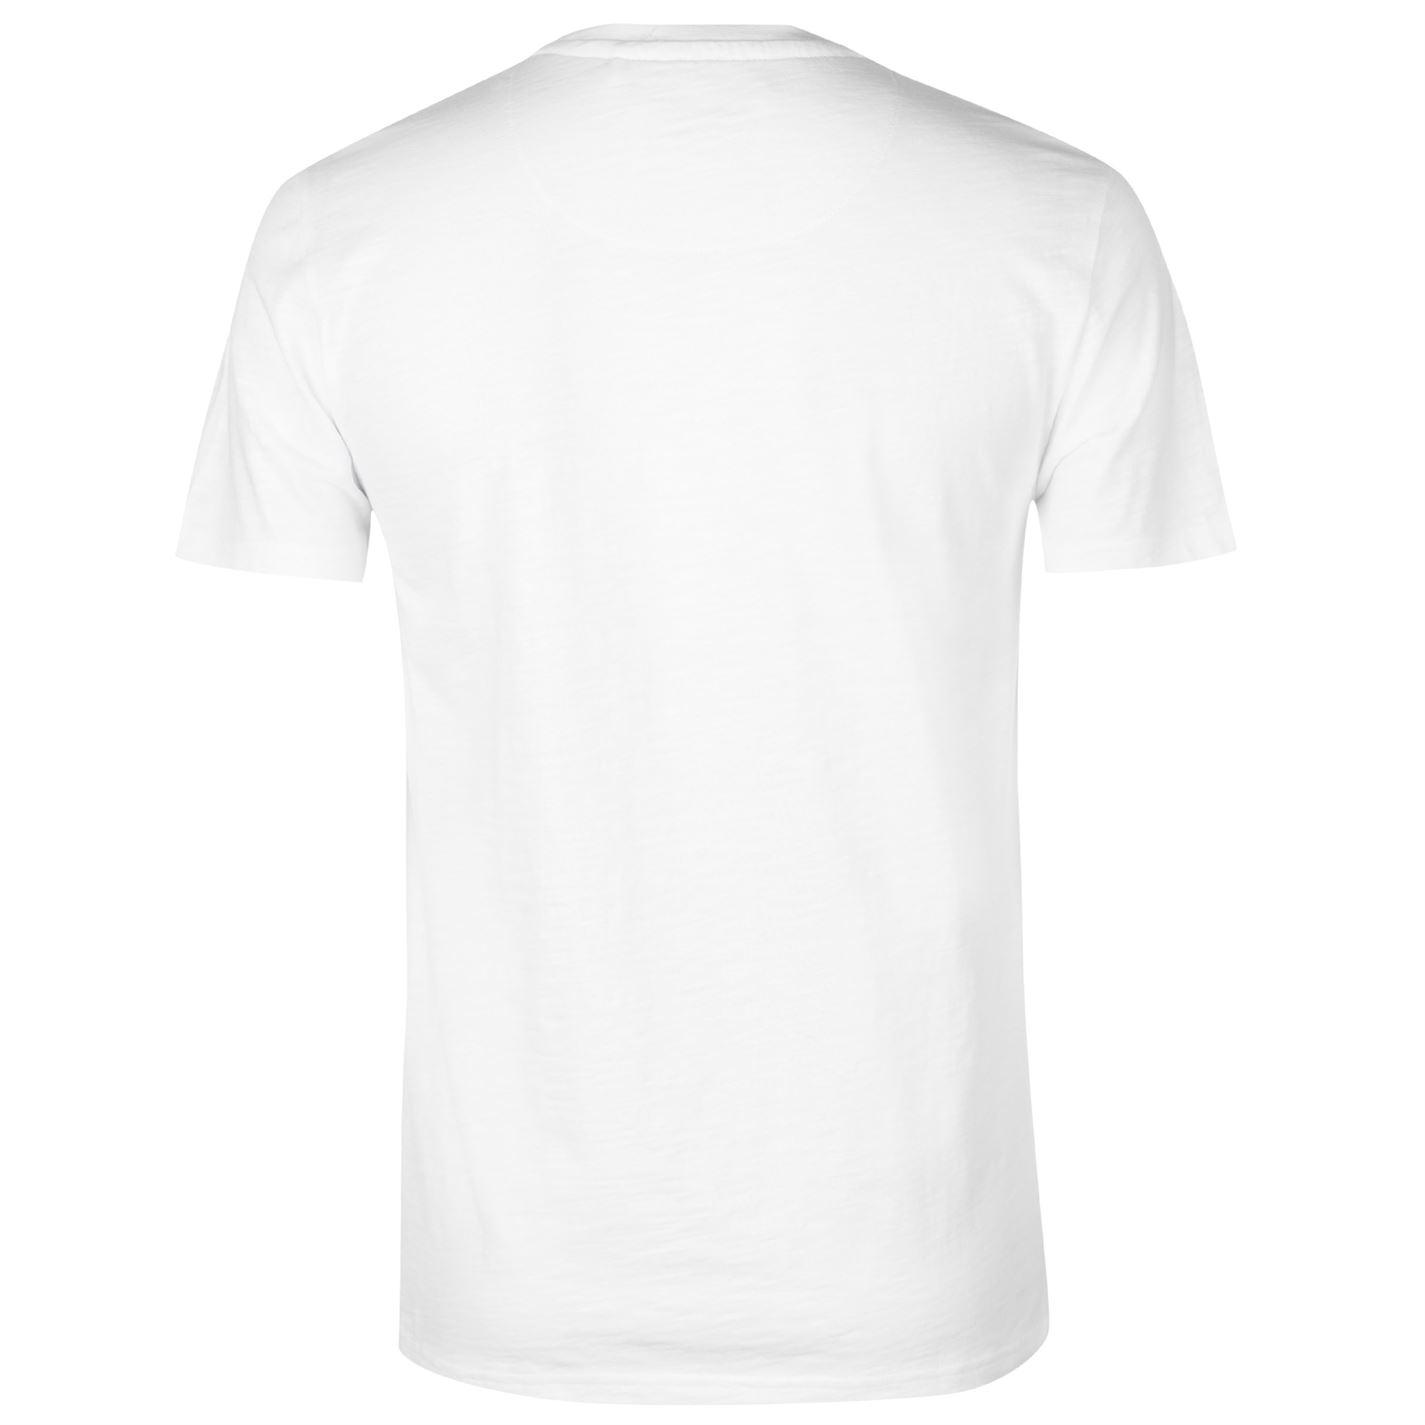 SoulCal Mens Photo T Shirt Crew Neck Tee Top Short Sleeve Print